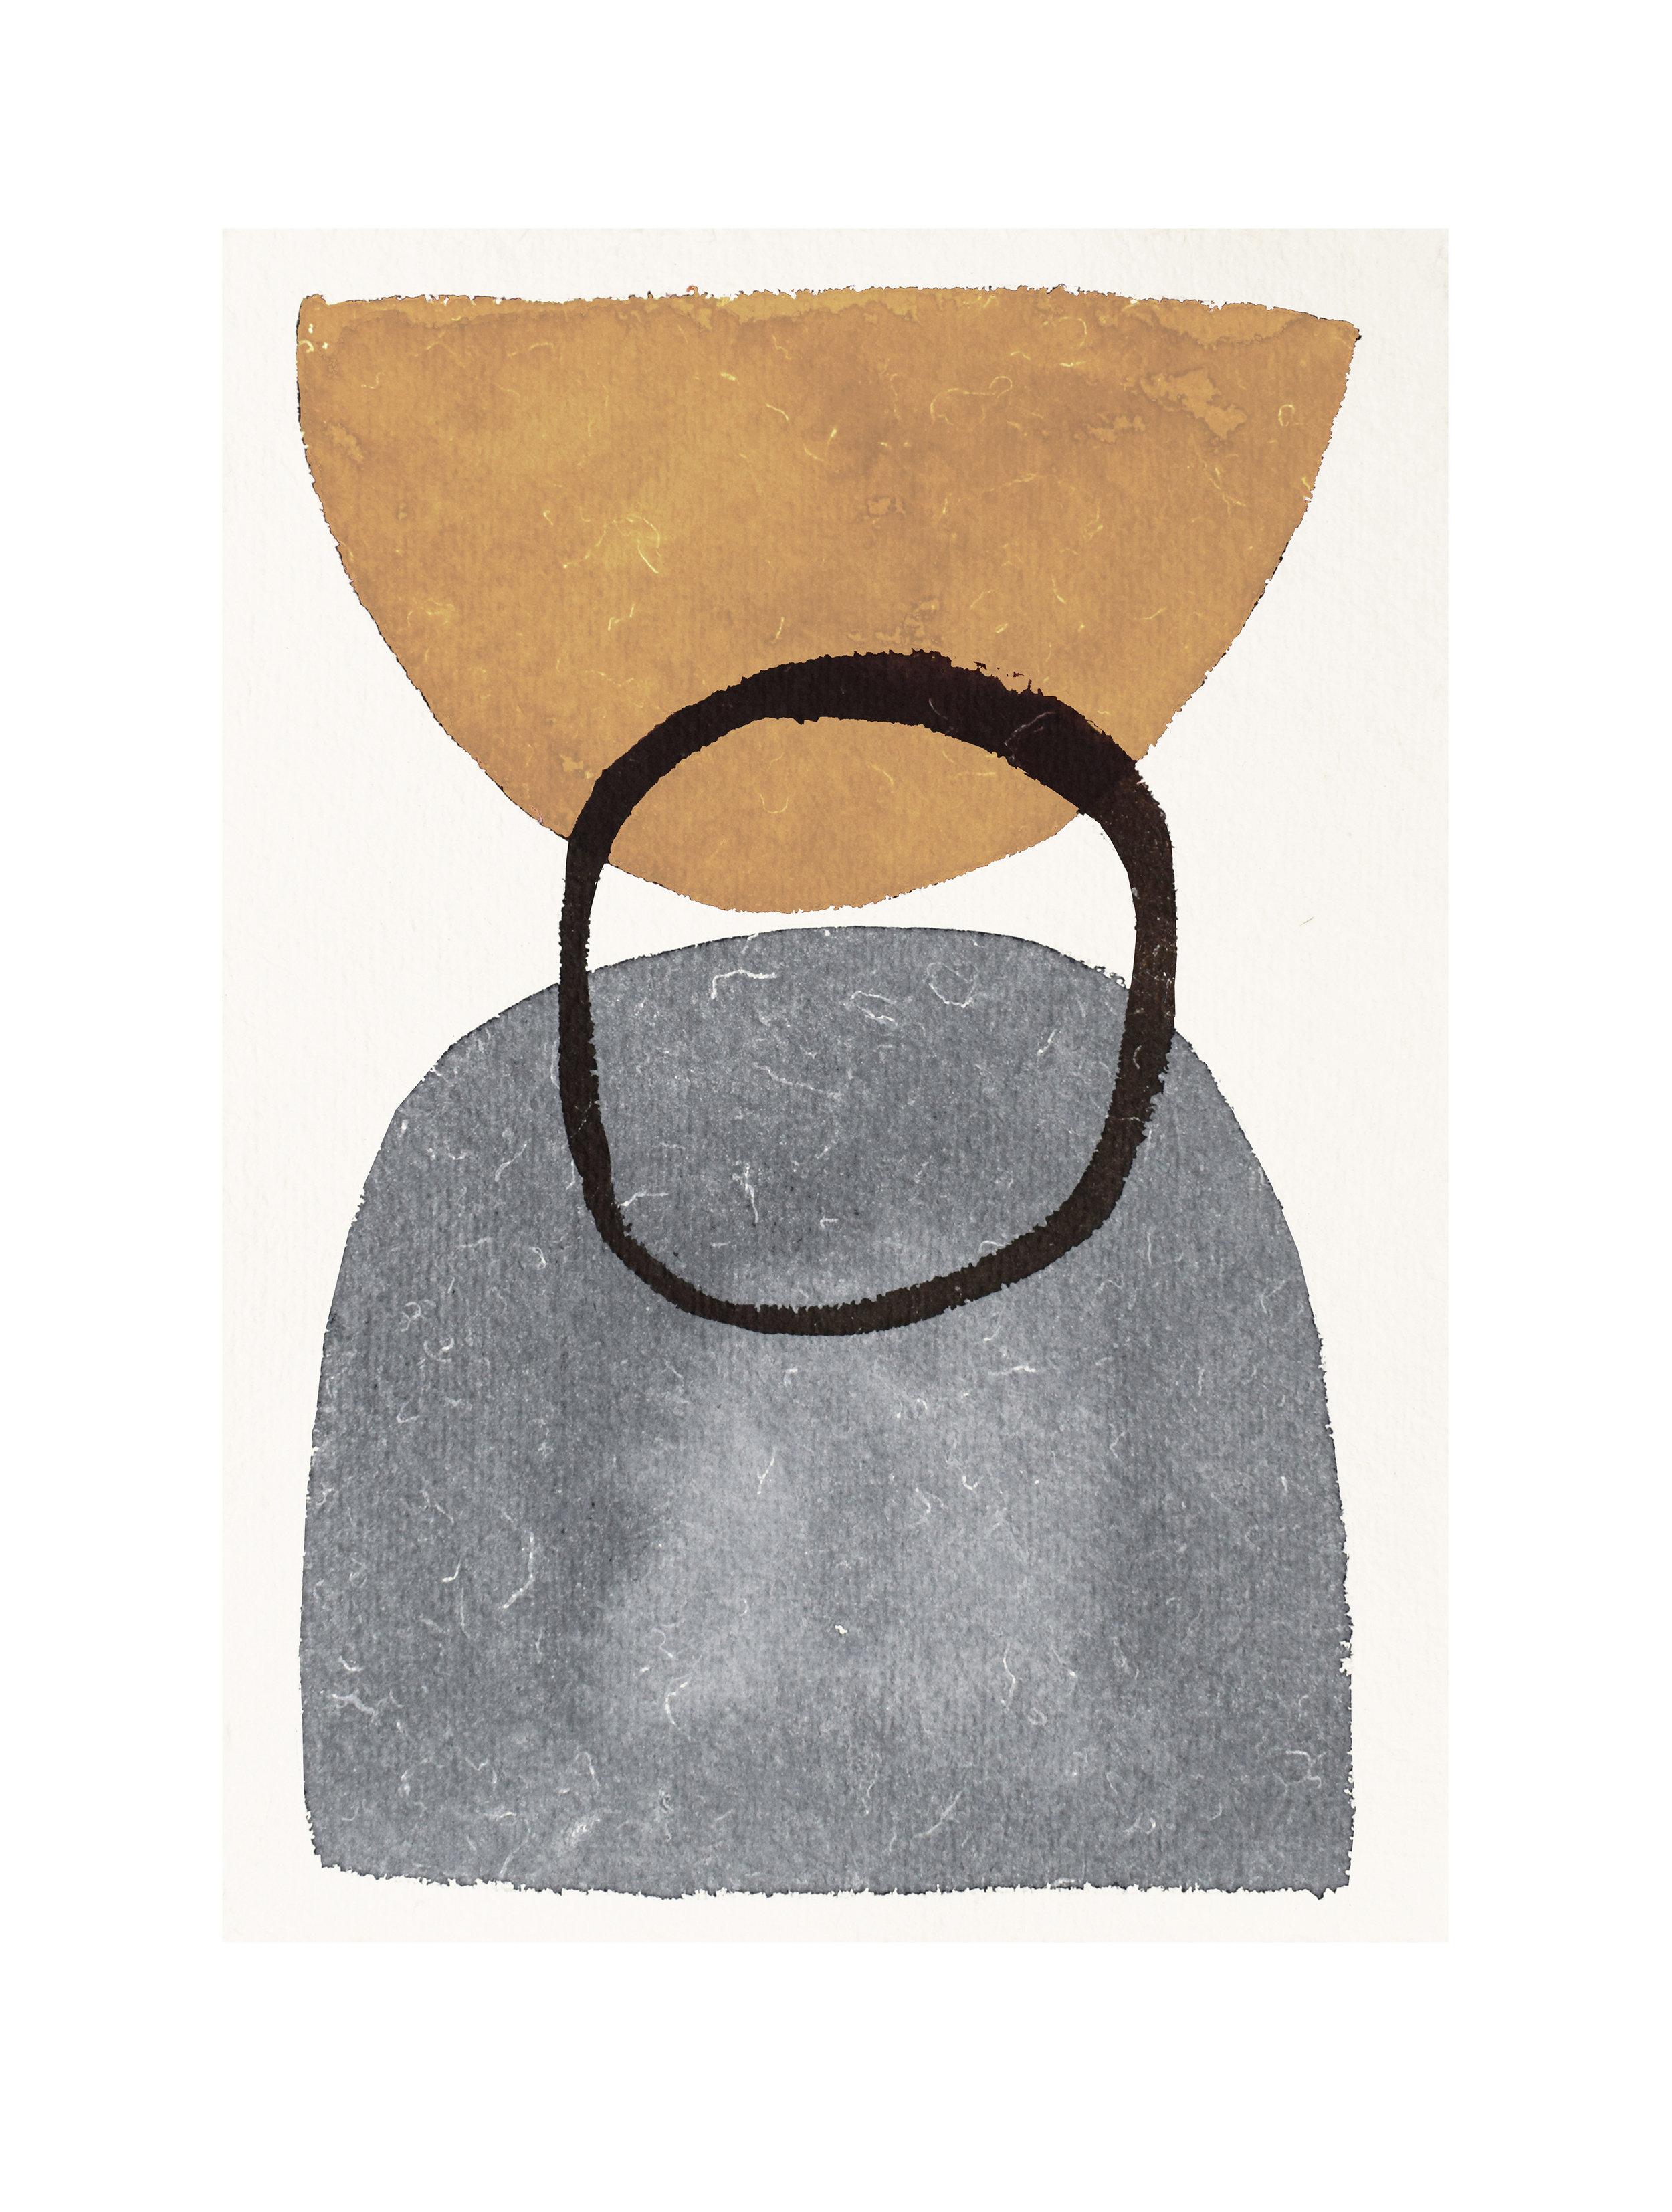 ©mogensenlopez.  limited edition: digital art print from painting on handmade paper https://www.houz.no/produkt/ochre-1-30x40/